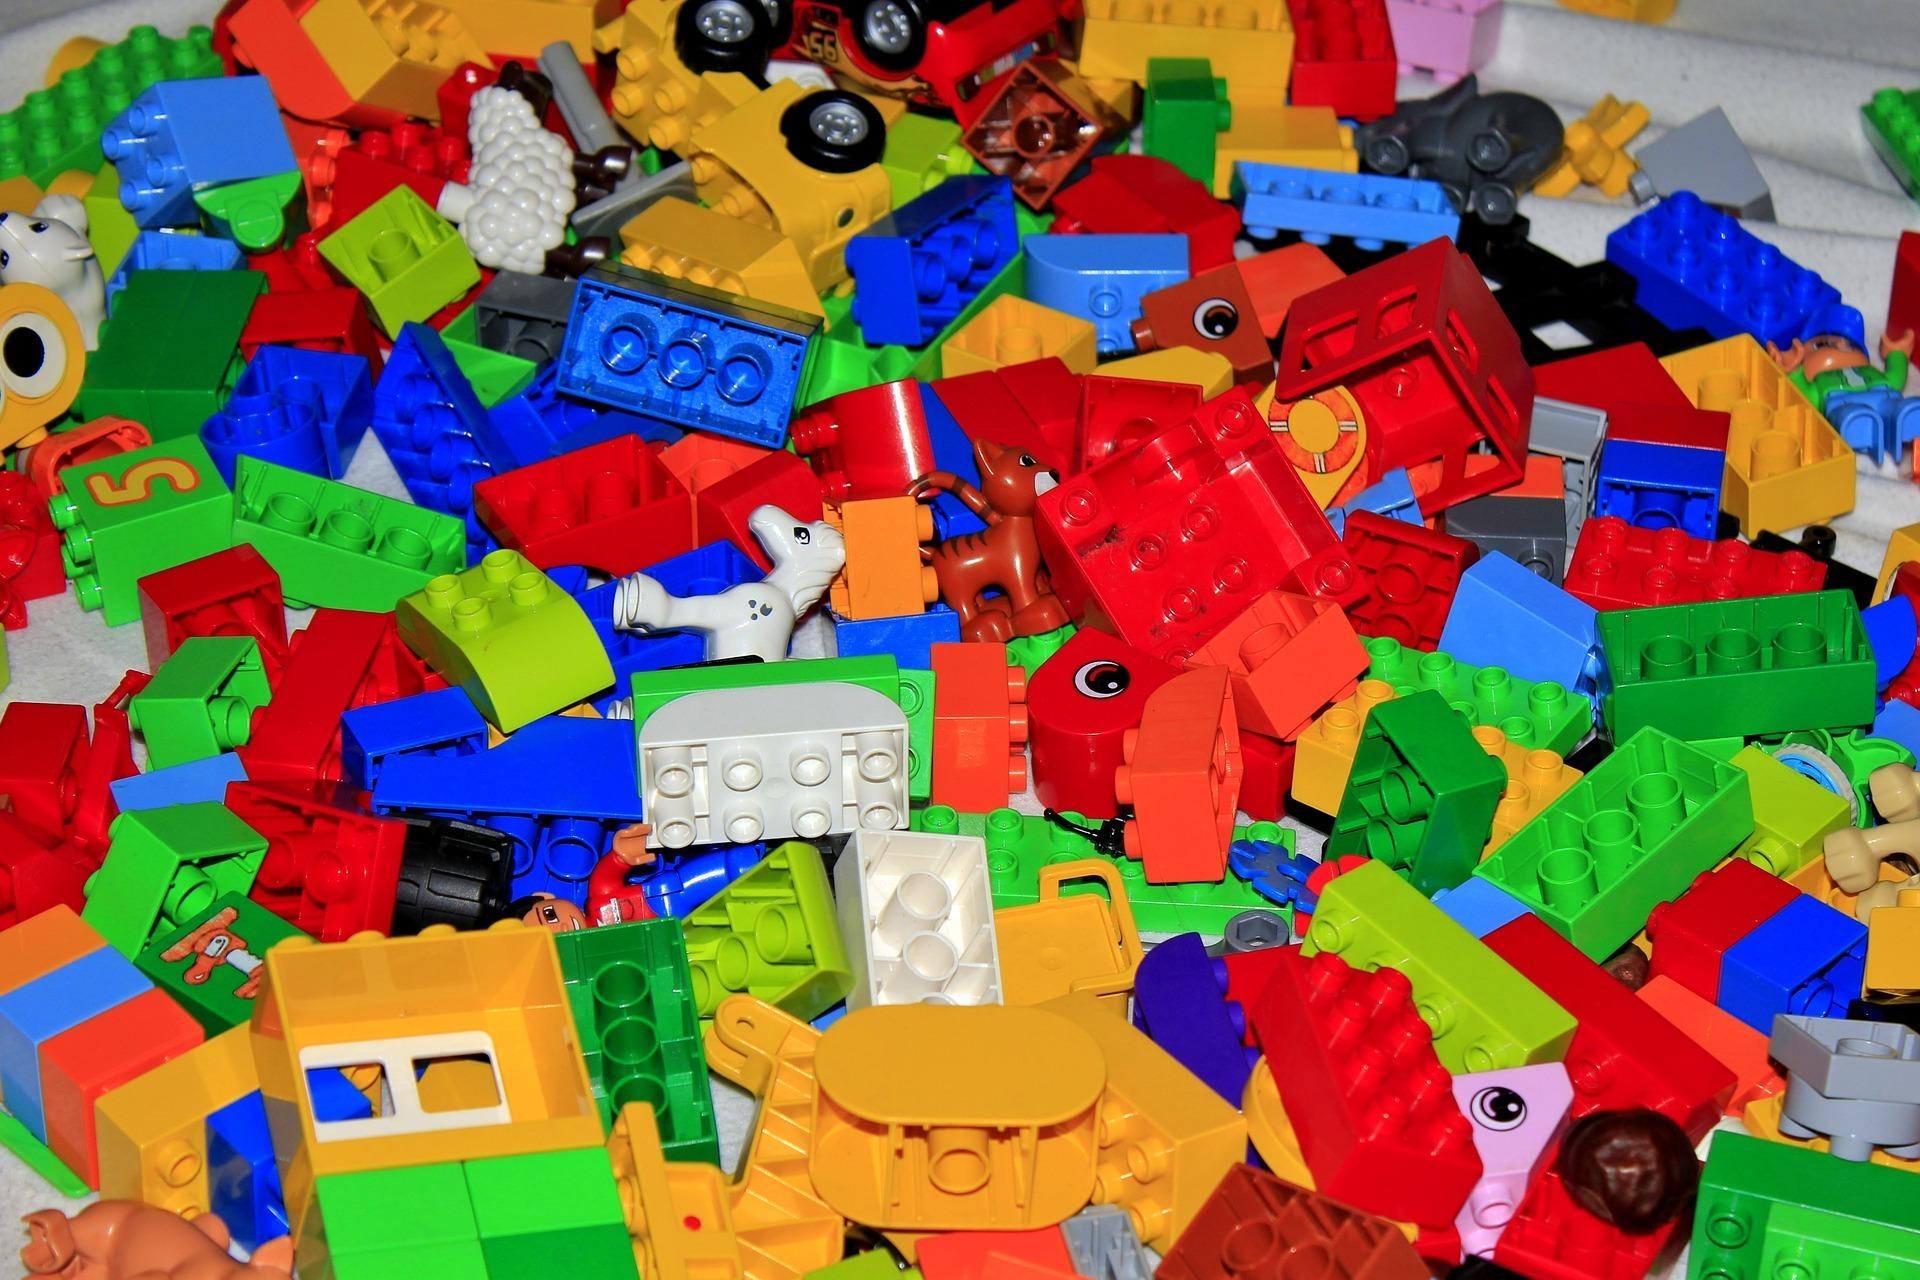 lego-blocks-1230133_1920.jpg